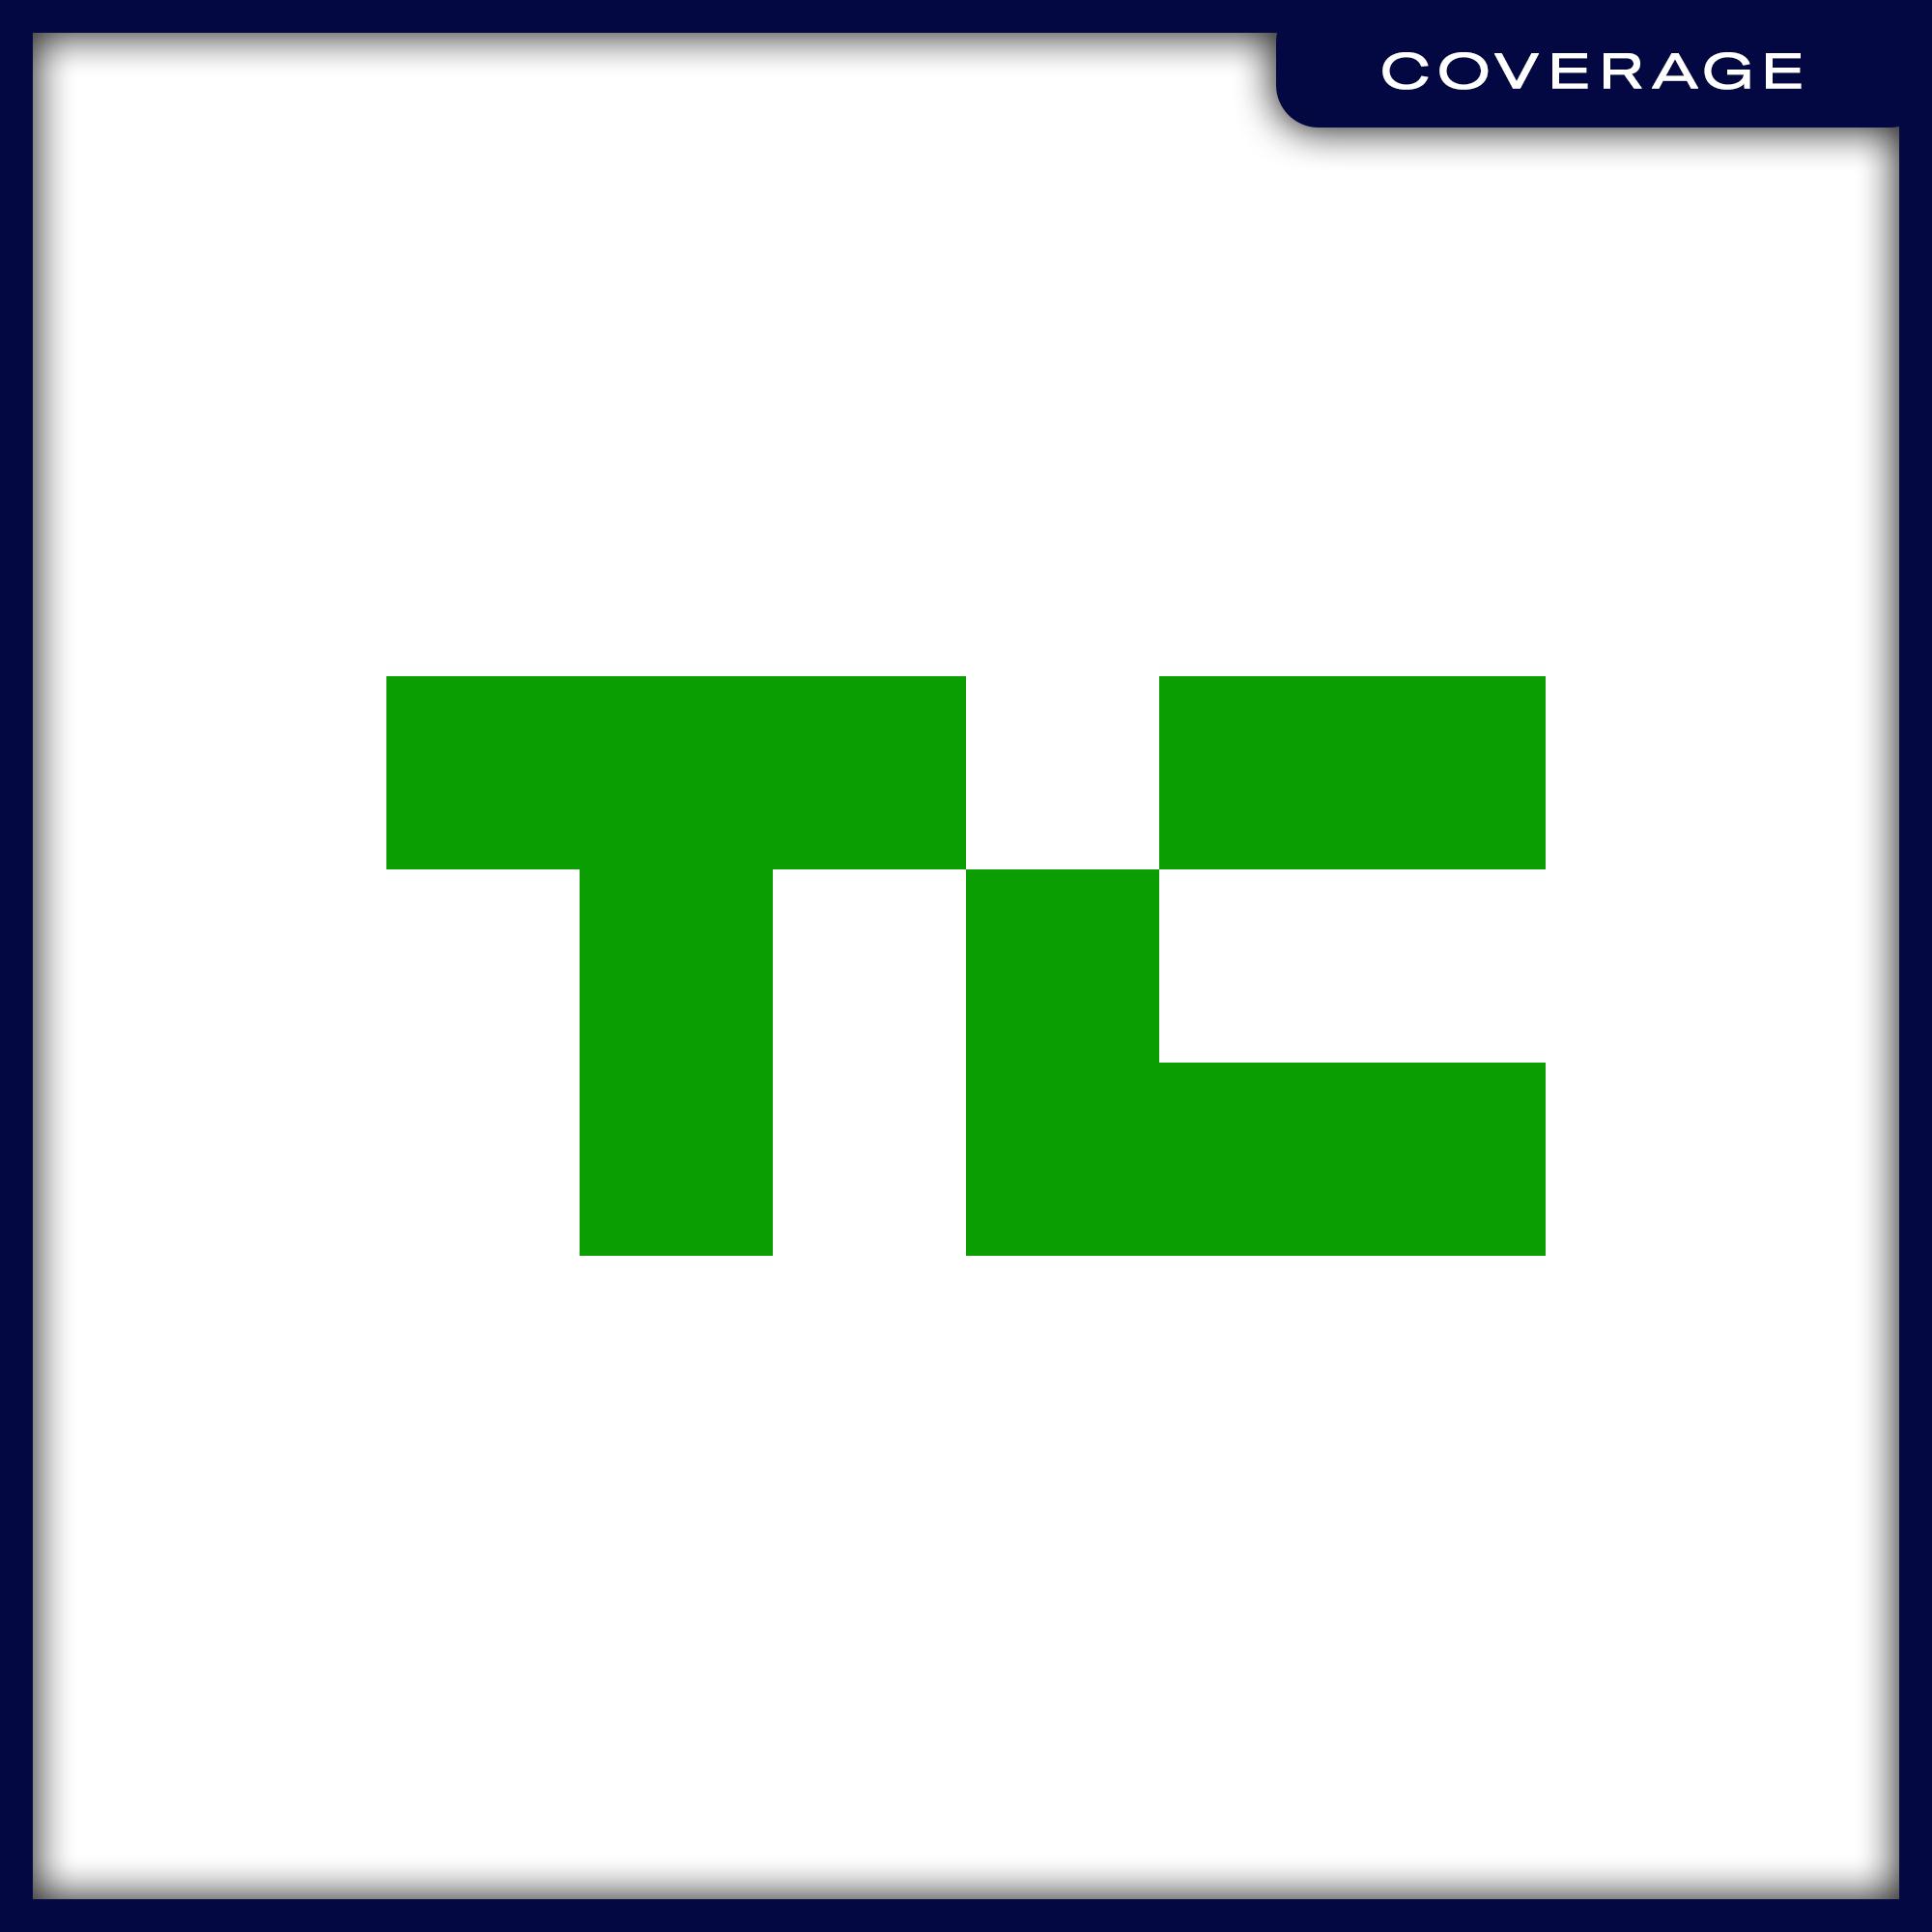 TechCrunchNews